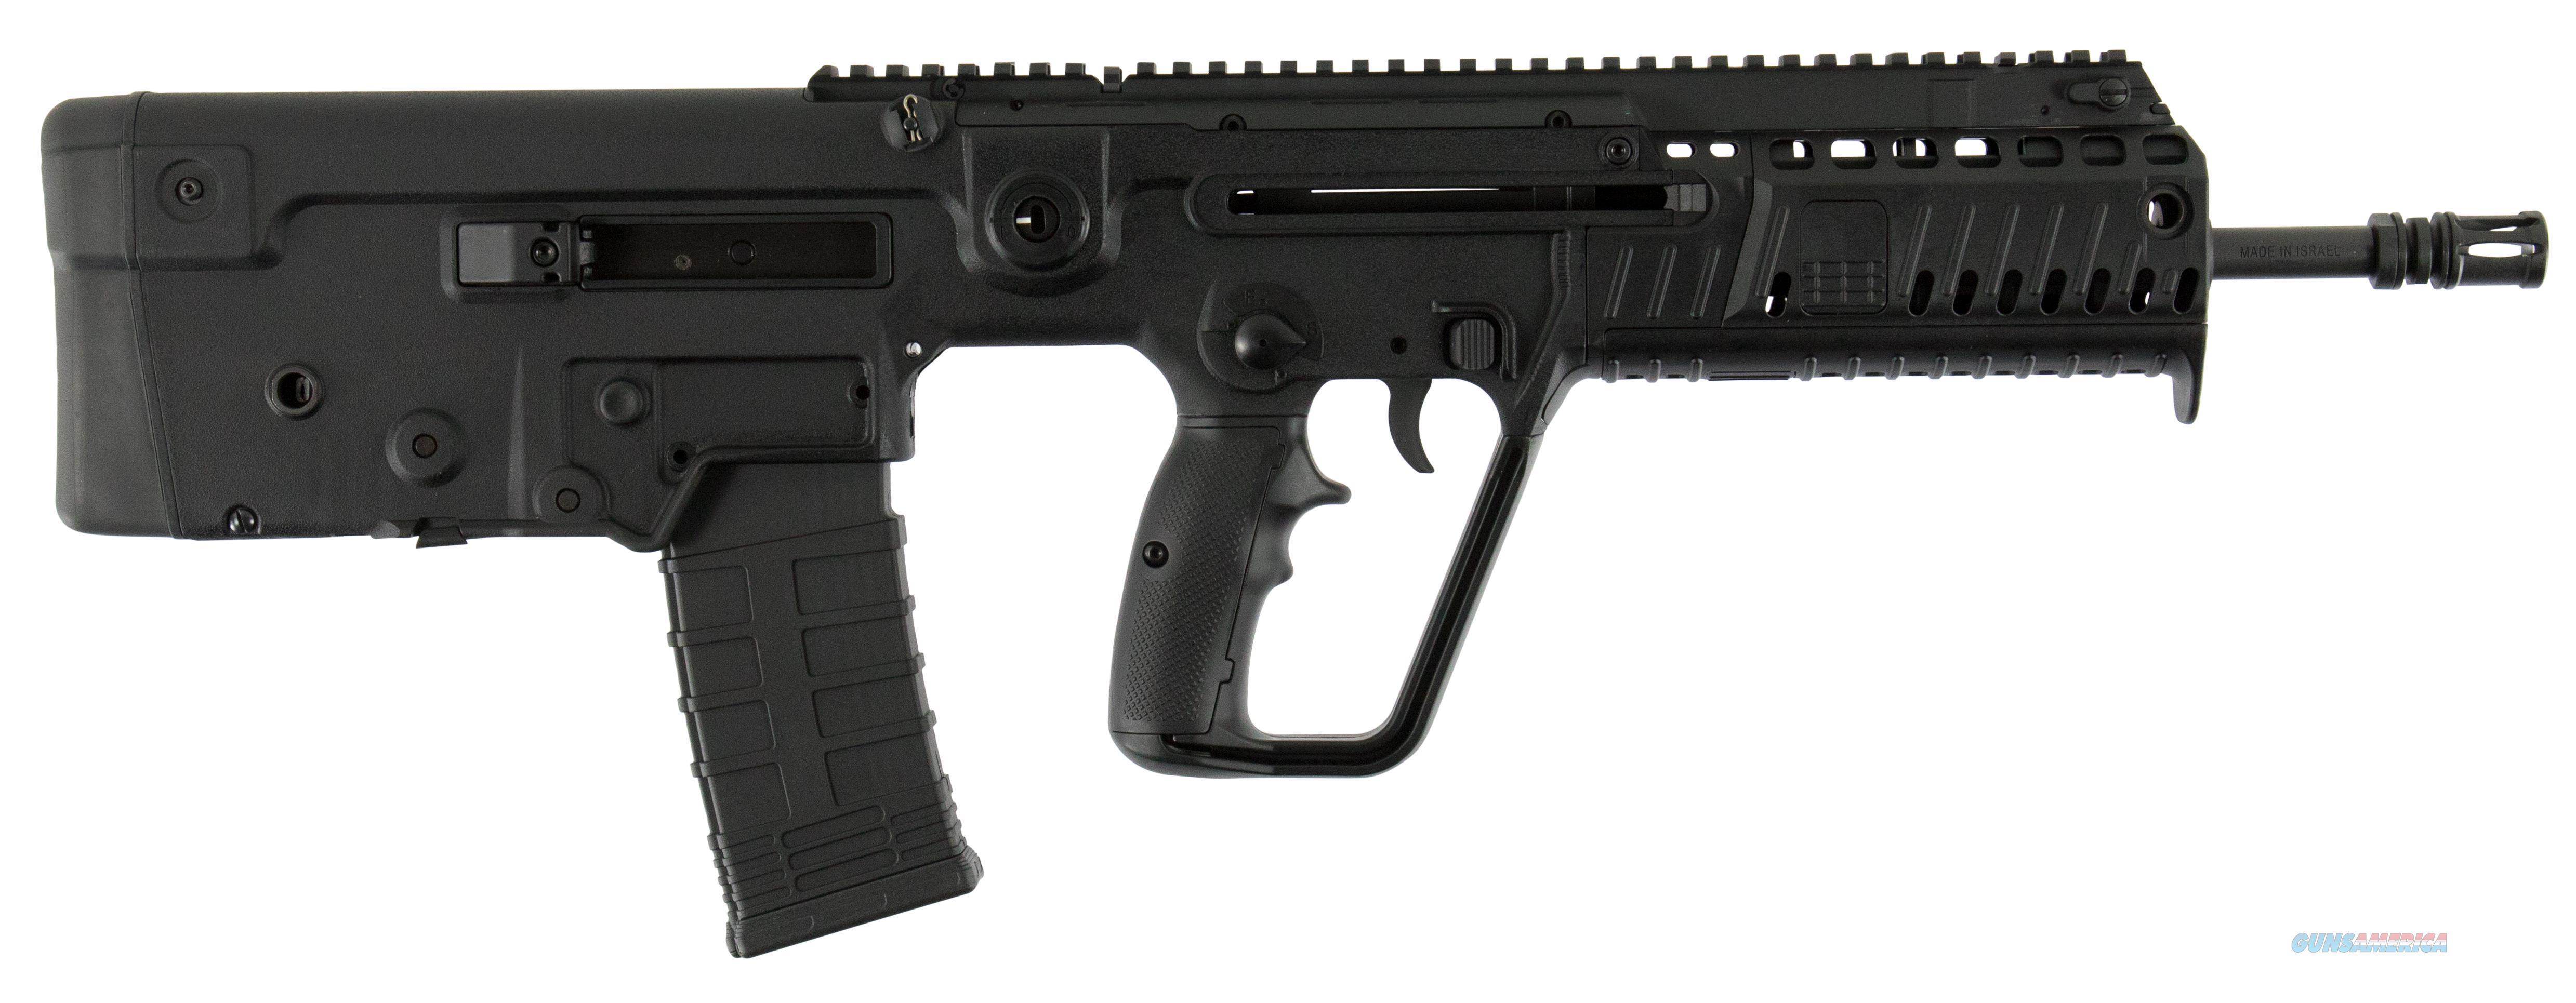 "Iwi Usa Tavor X95 5.56 18"" 30Rd Mag Blk XB18  Guns > Rifles > IJ Misc Rifles"